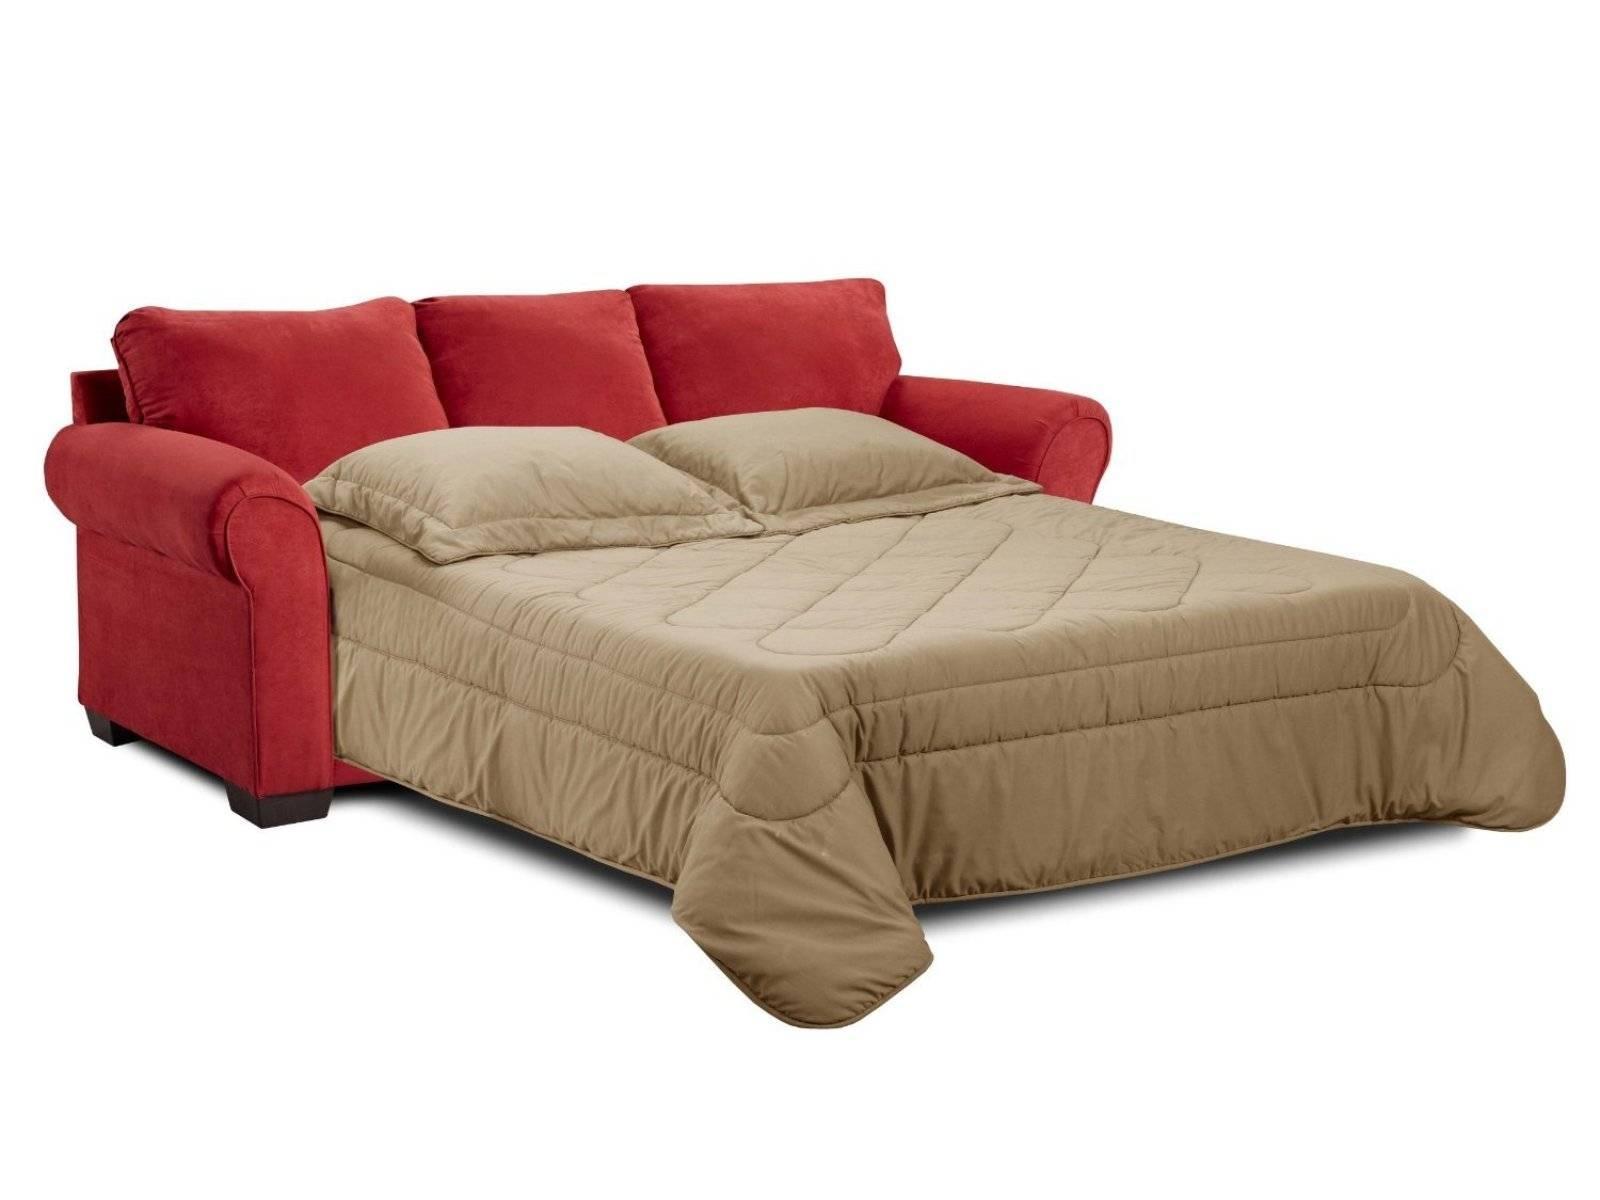 ▻ Sofa : 26 Wonderful Sleeper Sectional Sofa With Chaise Latest with regard to Sleeper Sectional Sofas (Image 30 of 30)